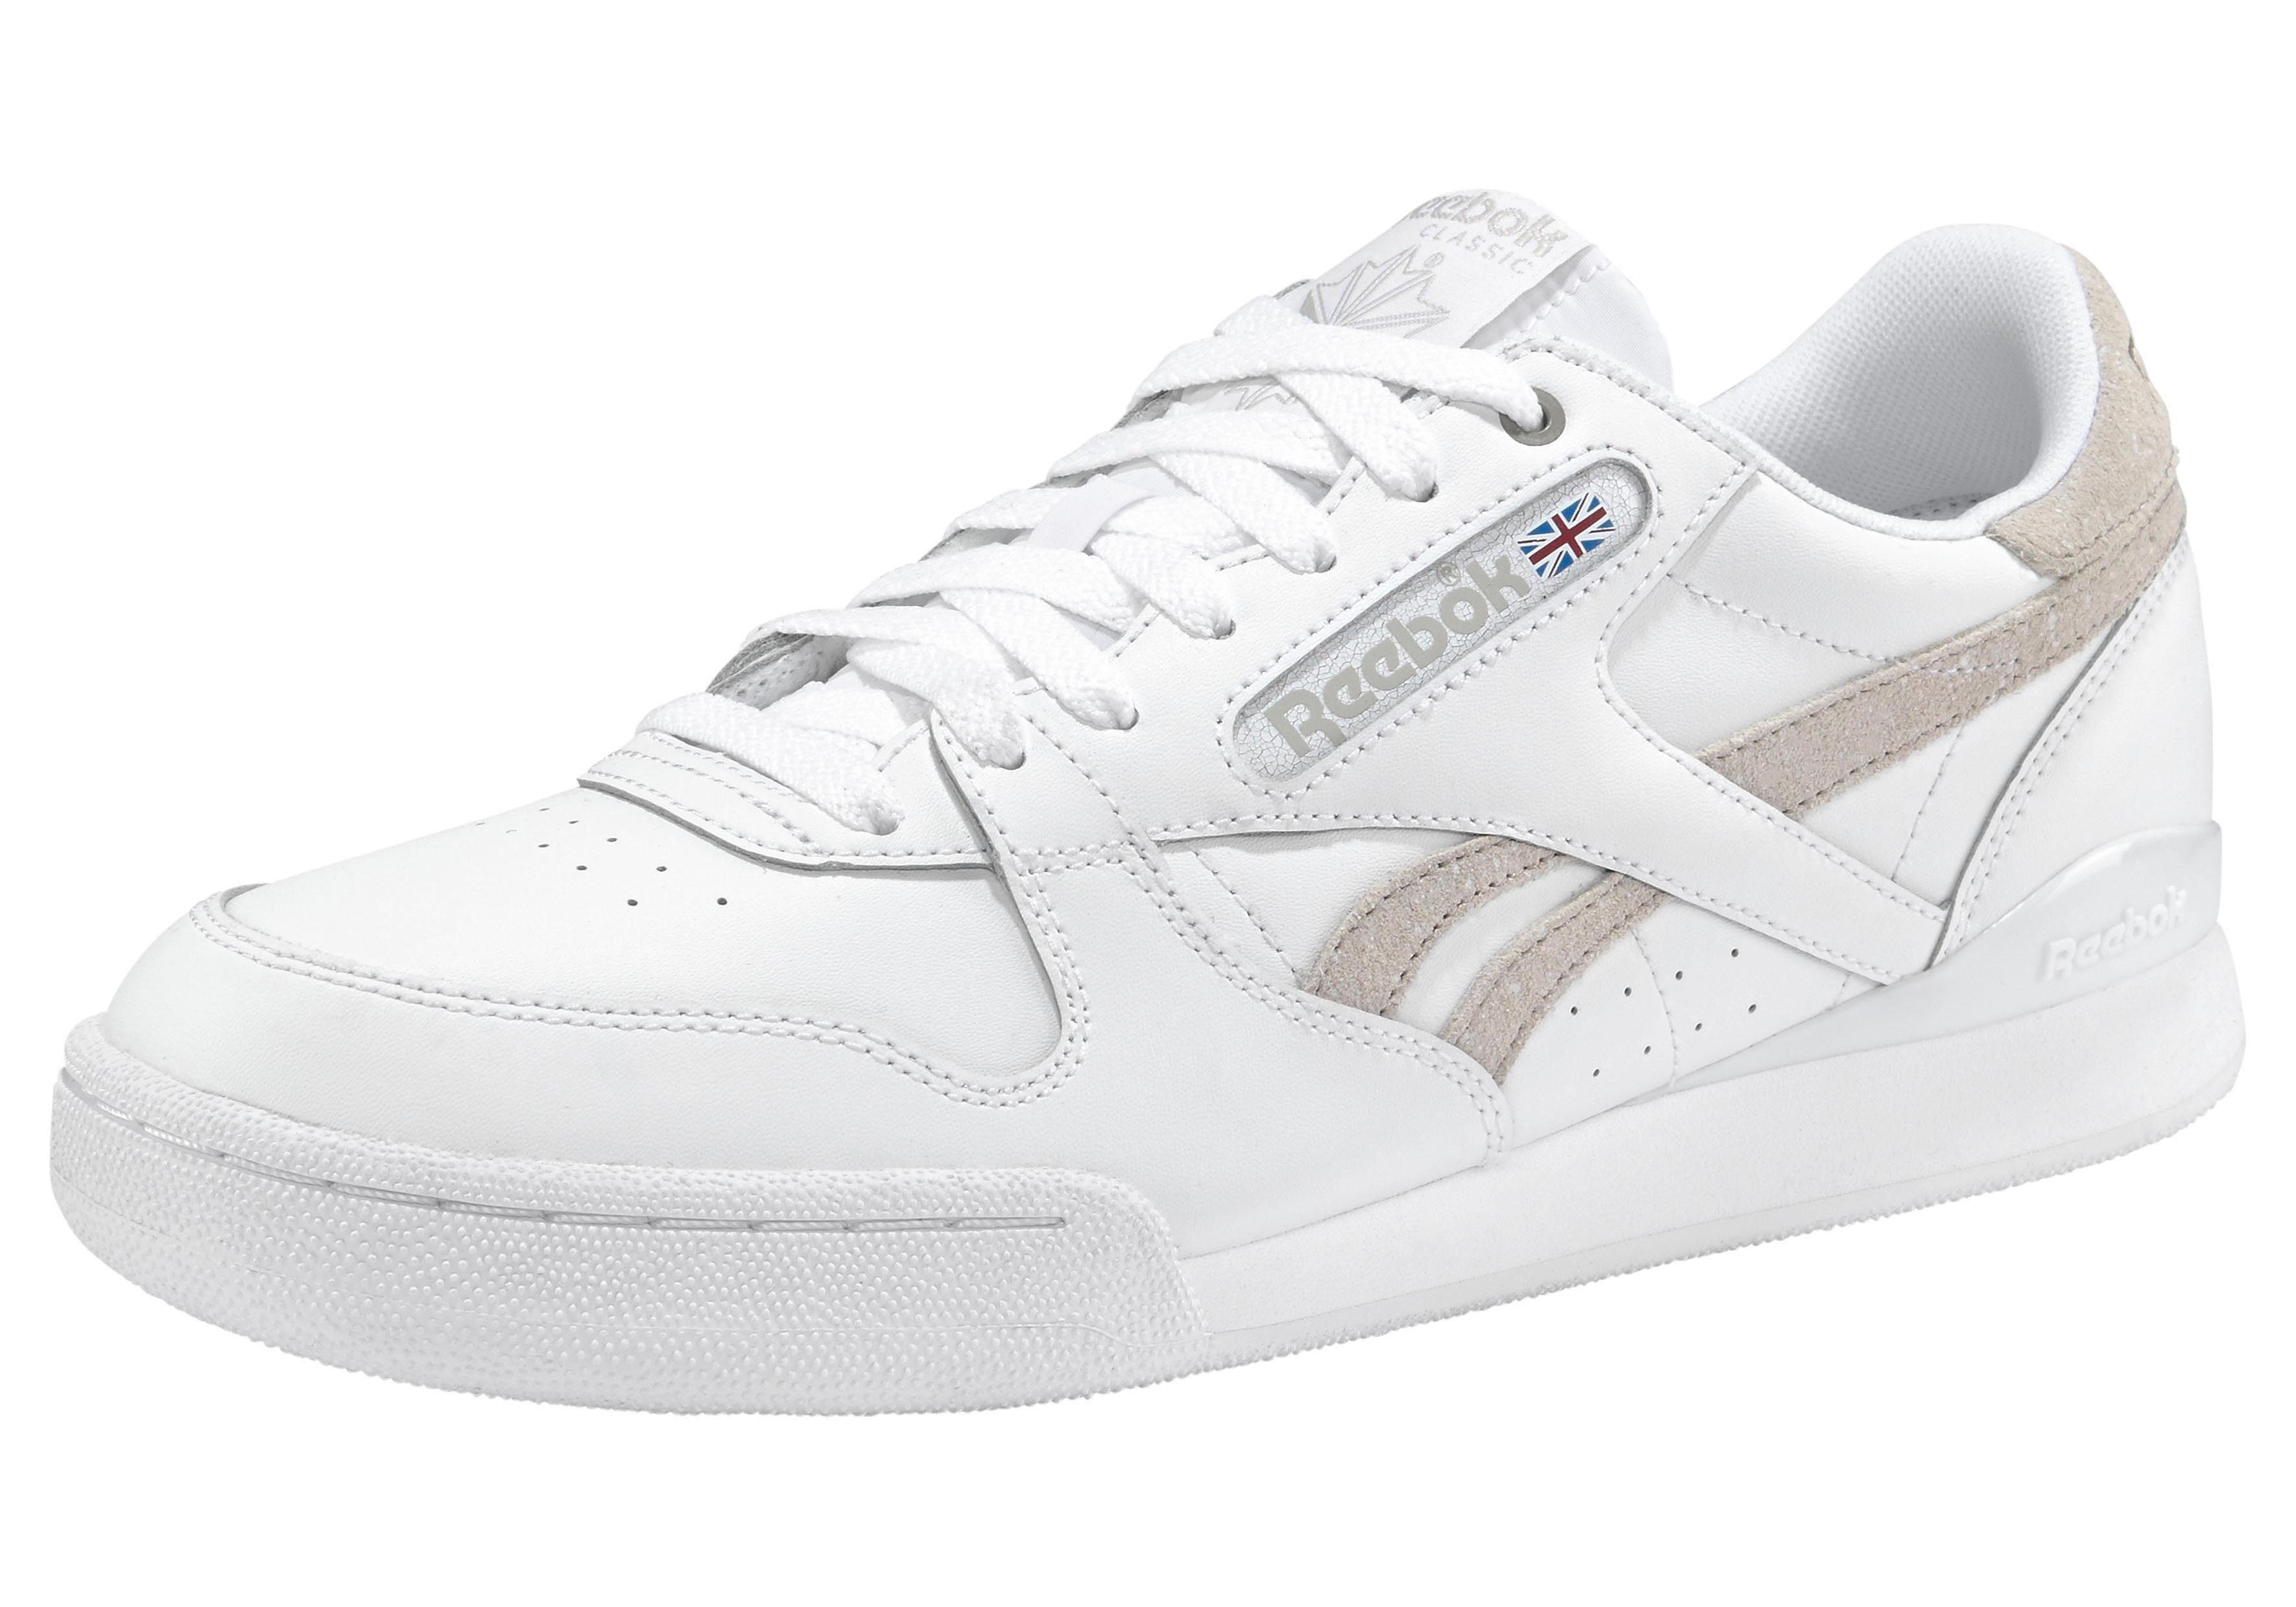 Reebok SneakerOtto Classic Pro Mu« Phase 1 »wmns 80kXNOPnw